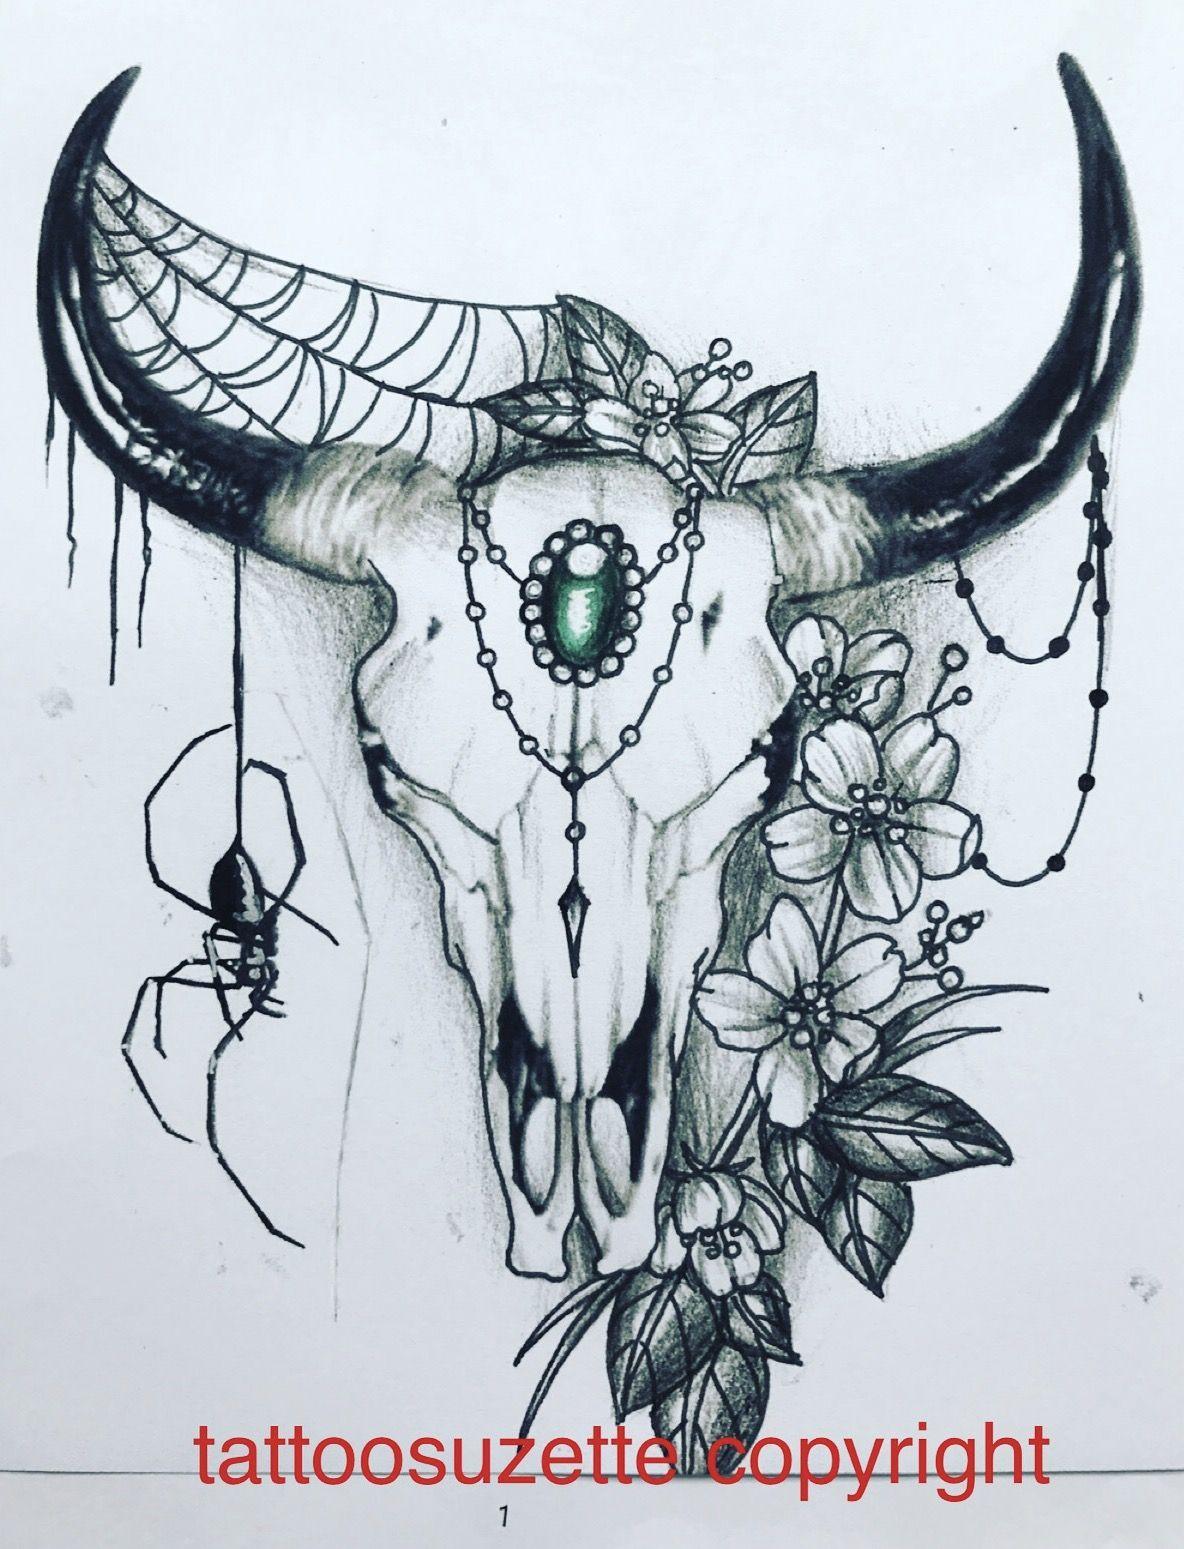 bull skull tattoo design tattoos pinterest tatuajes calaberas y dibujos. Black Bedroom Furniture Sets. Home Design Ideas